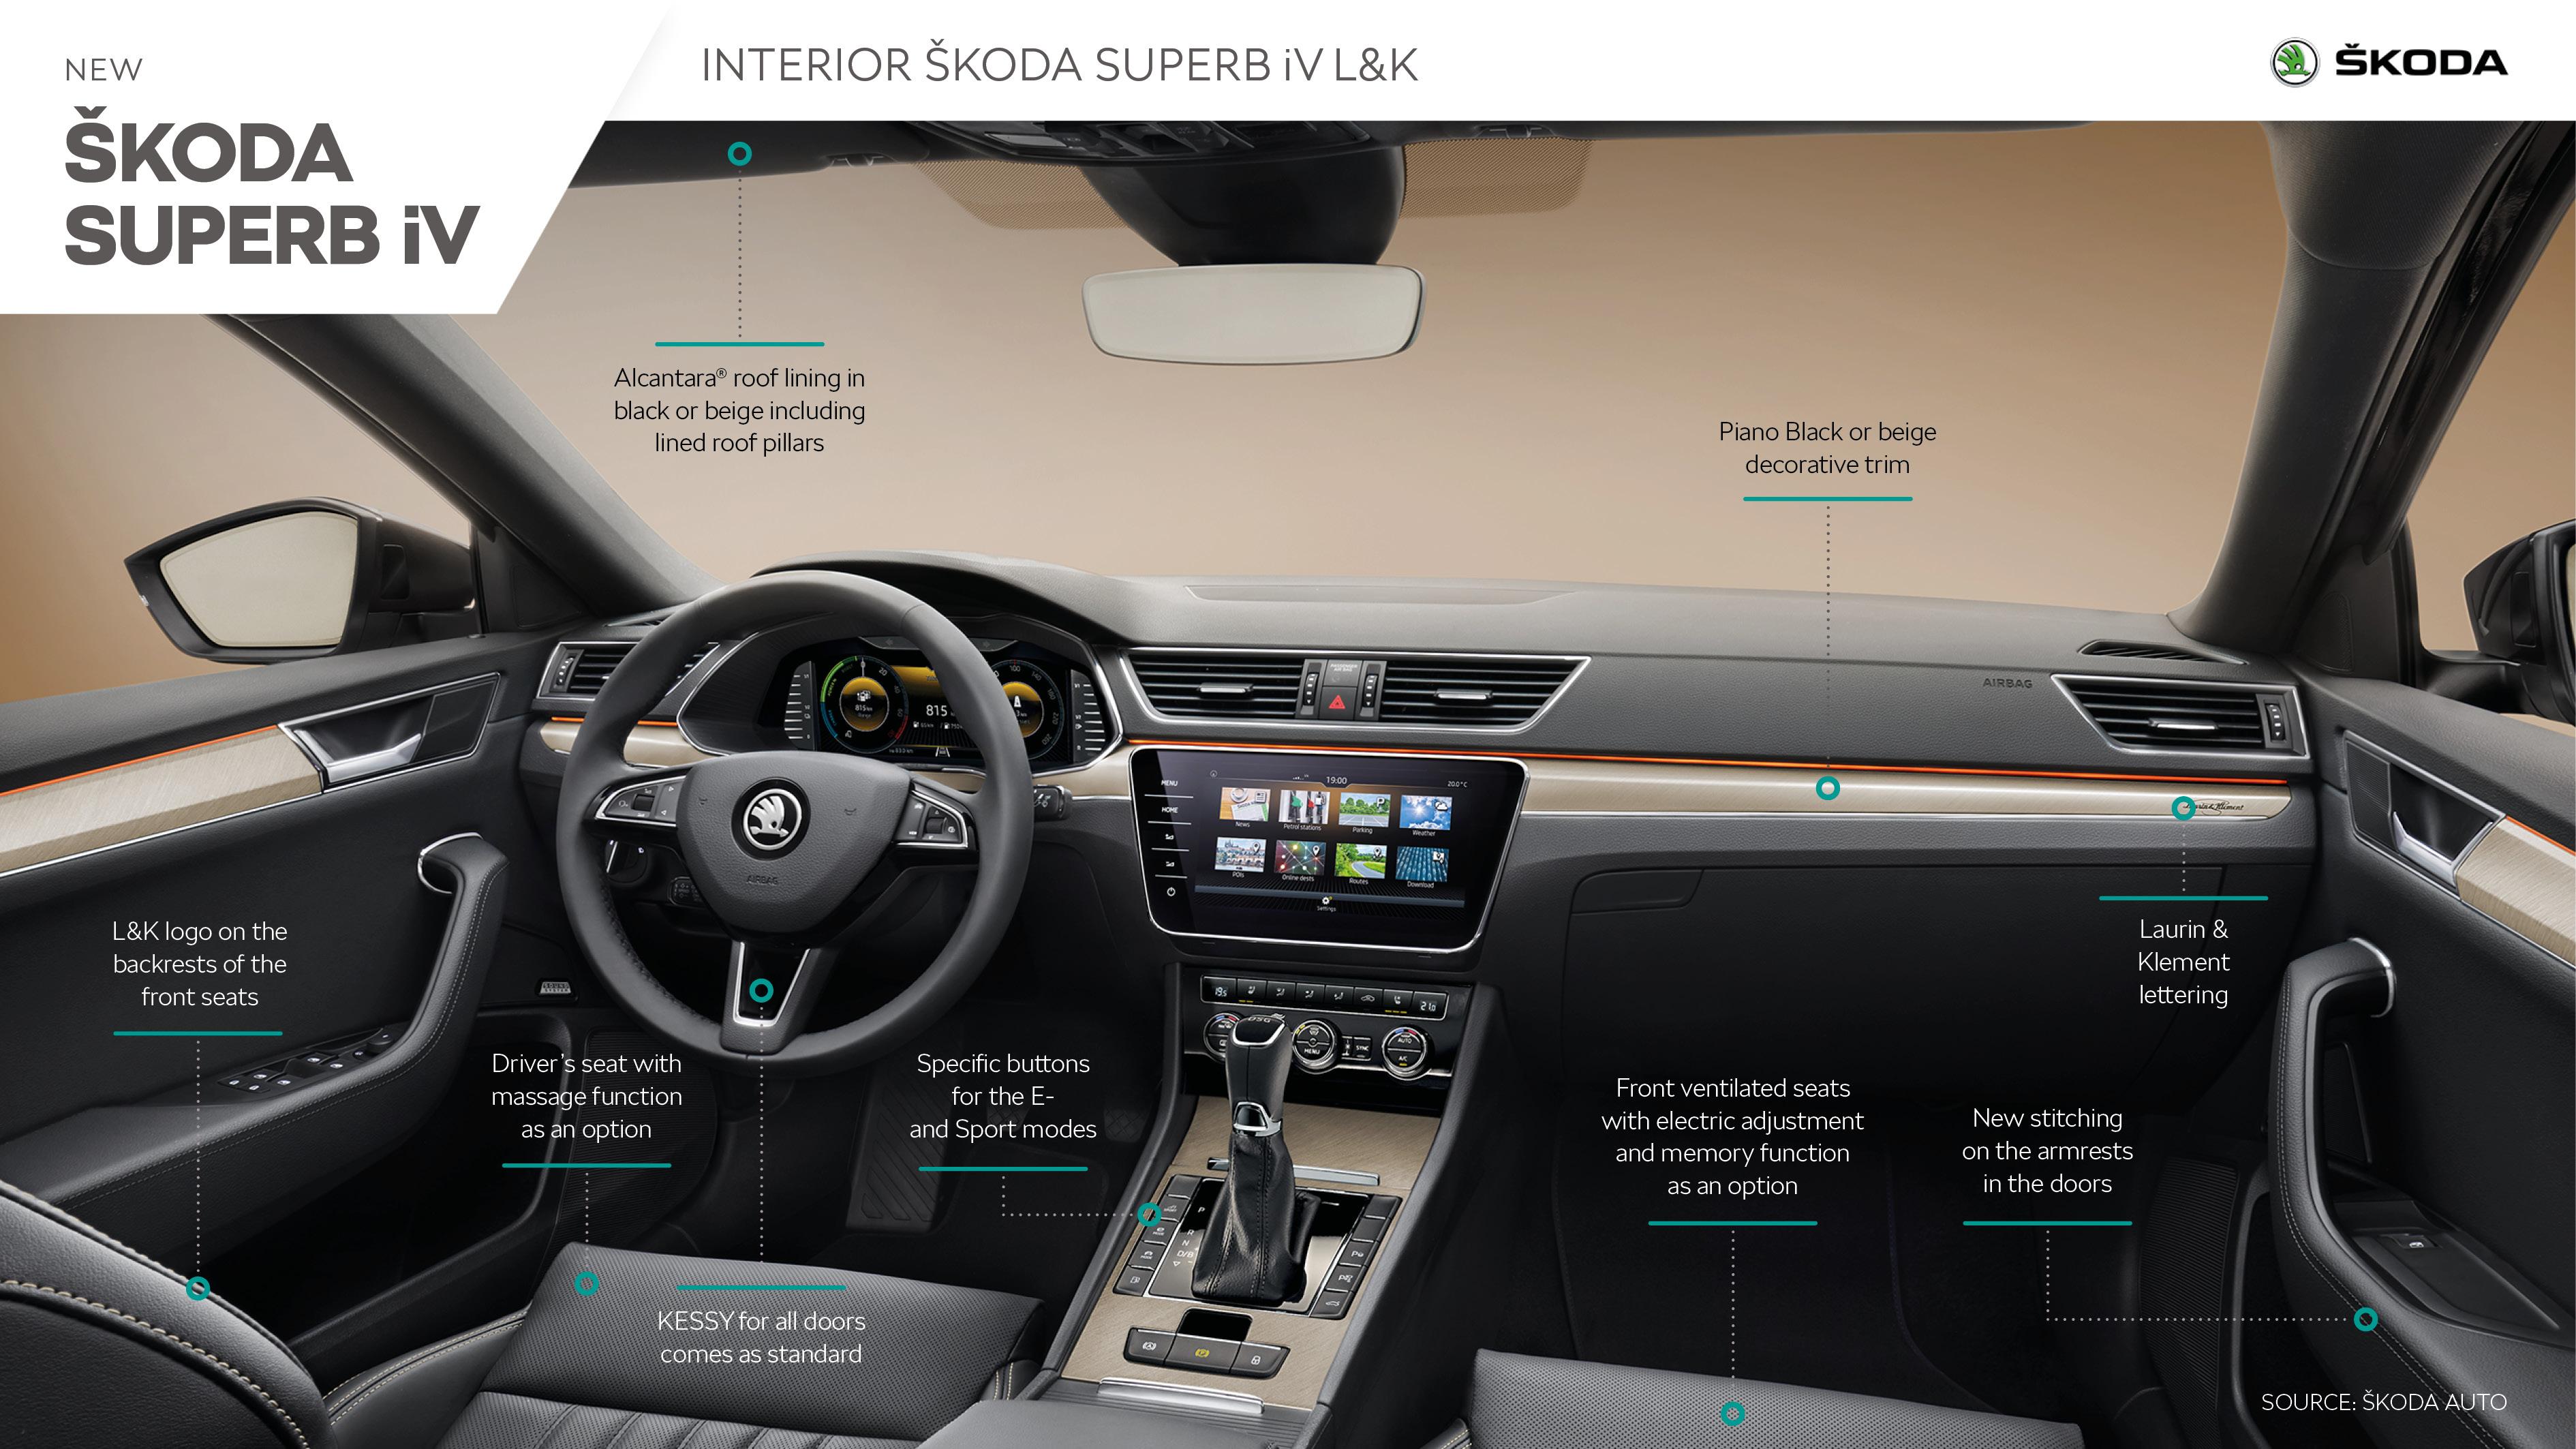 ŠKODA SUPERB iV L&K - Infographic